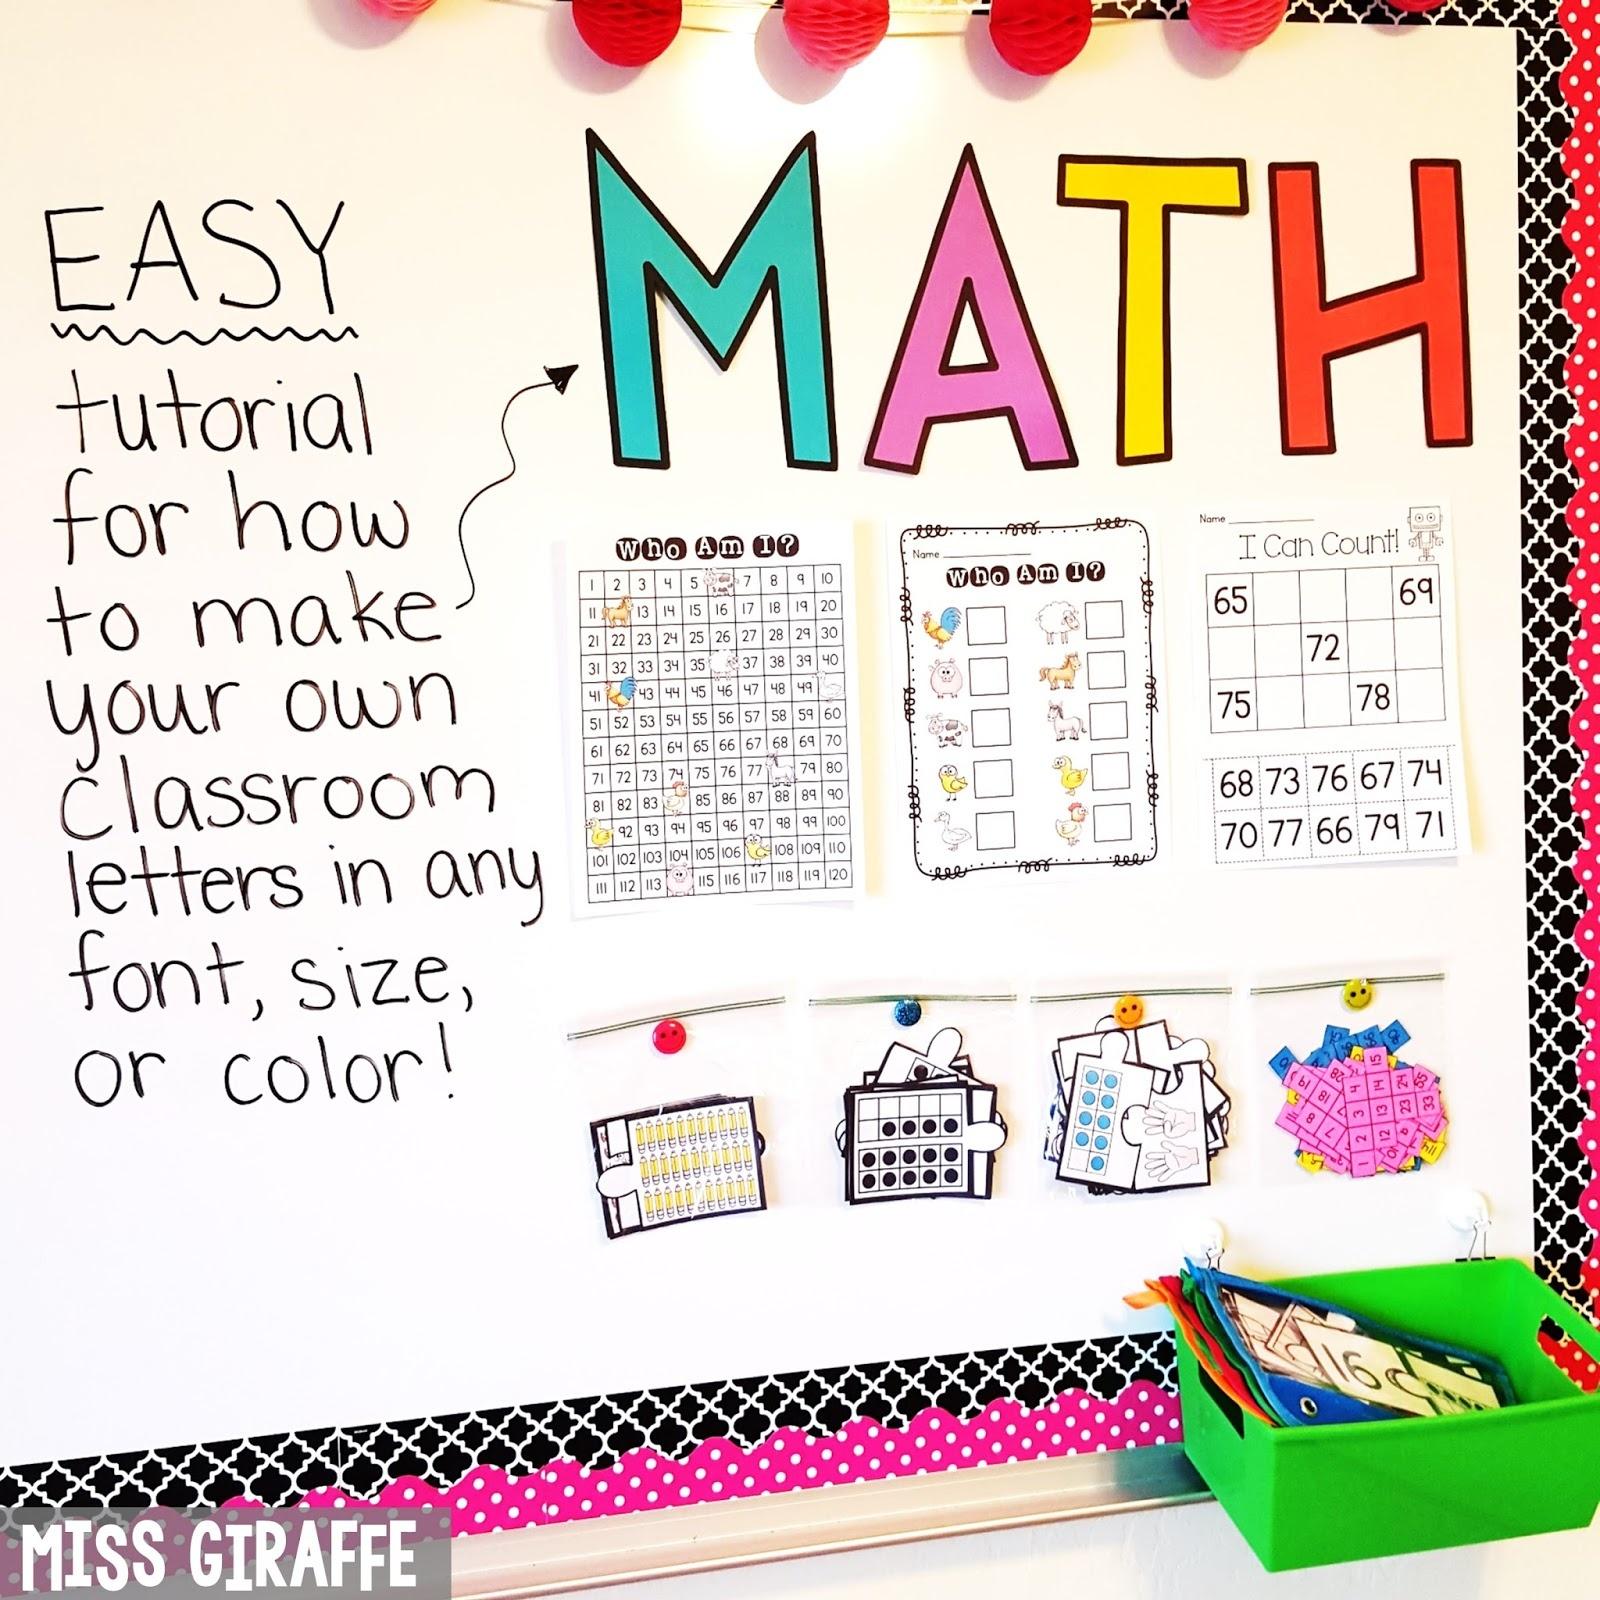 Miss Giraffe's Class: Diy Classroom Decor Bulletin Board Letters - Free Printable Bulletin Board Letters